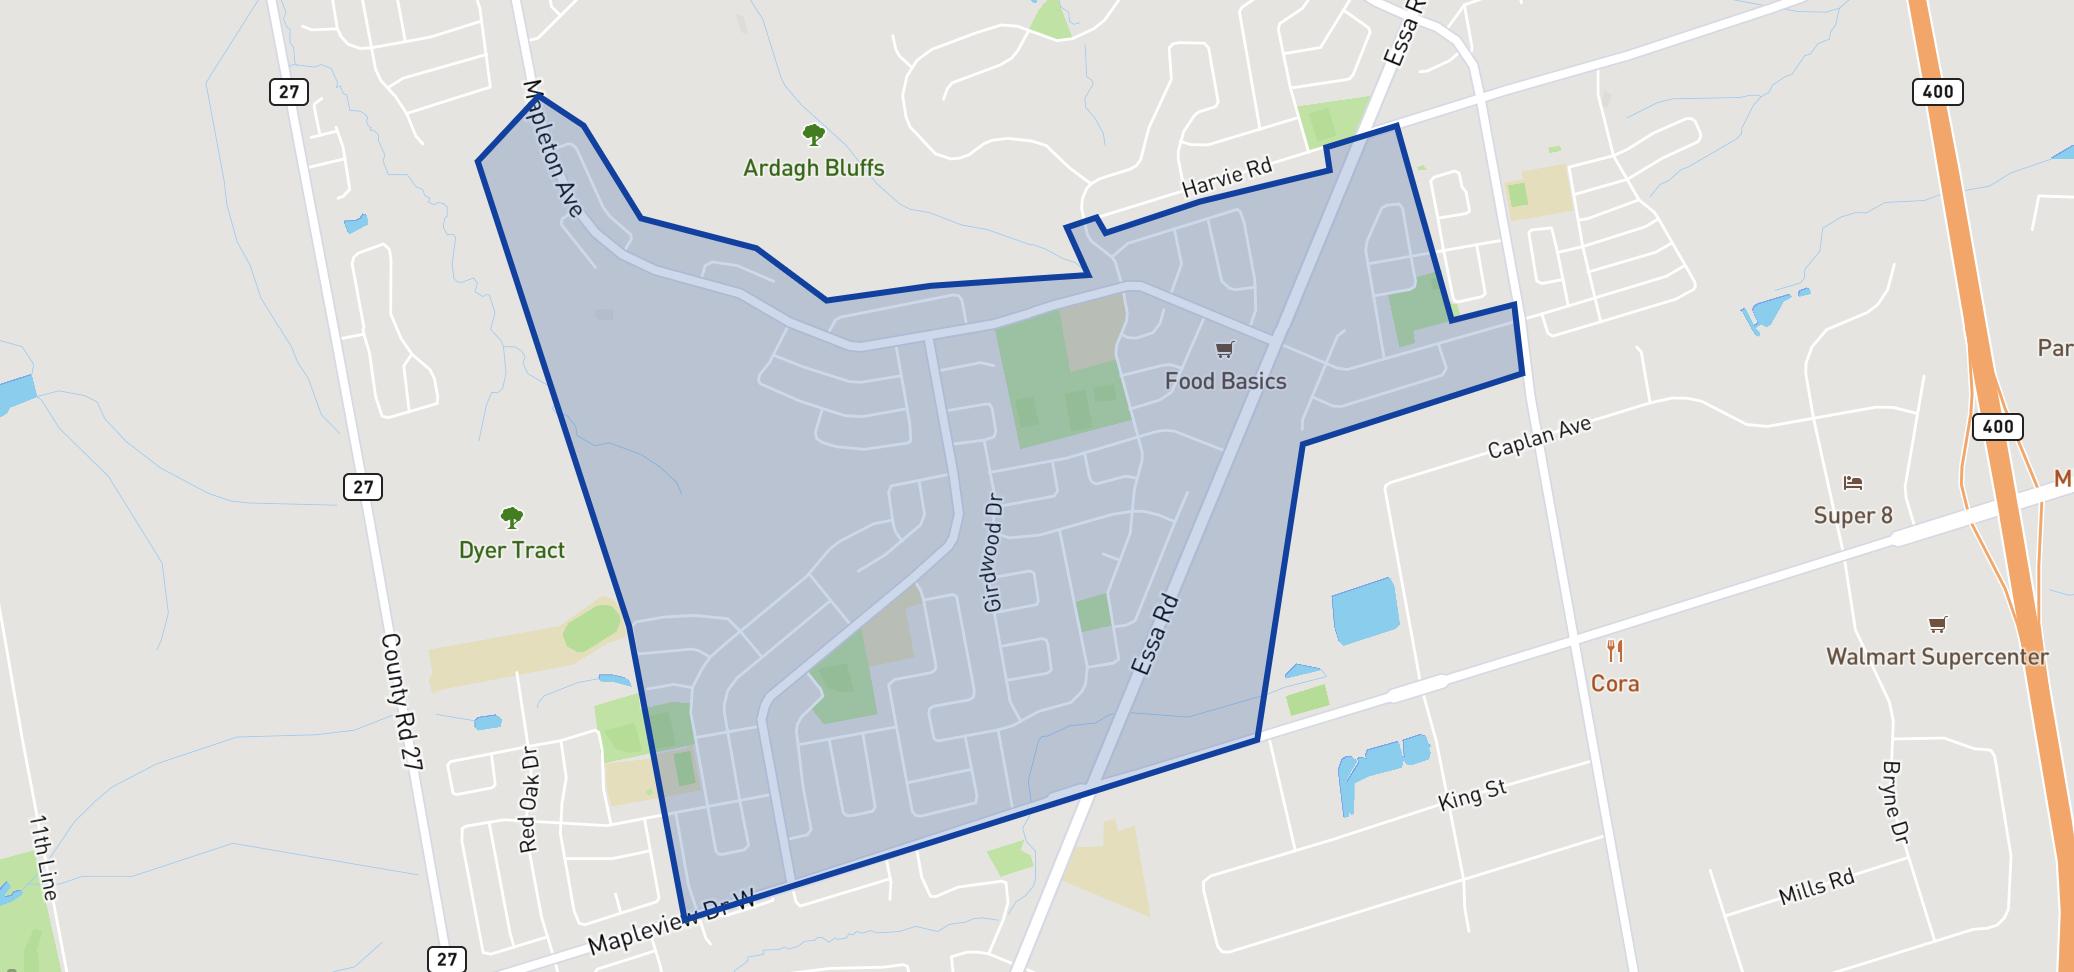 St Bernadette Elementary School neighbourhood borders